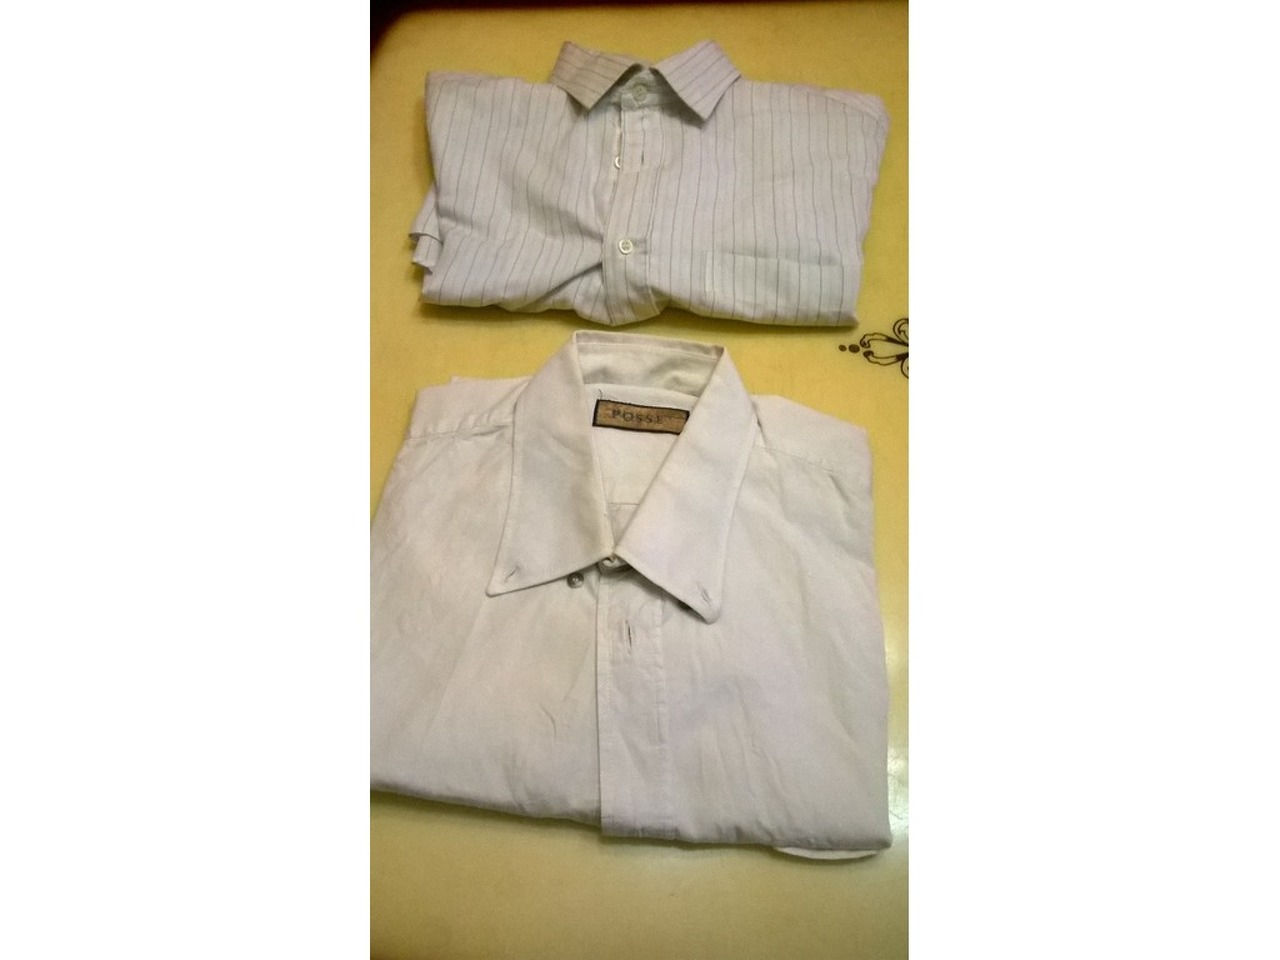 Camisas Diversas (2ª mão) WestPoint, Emidio Tucci, Posse, etc - 3/4